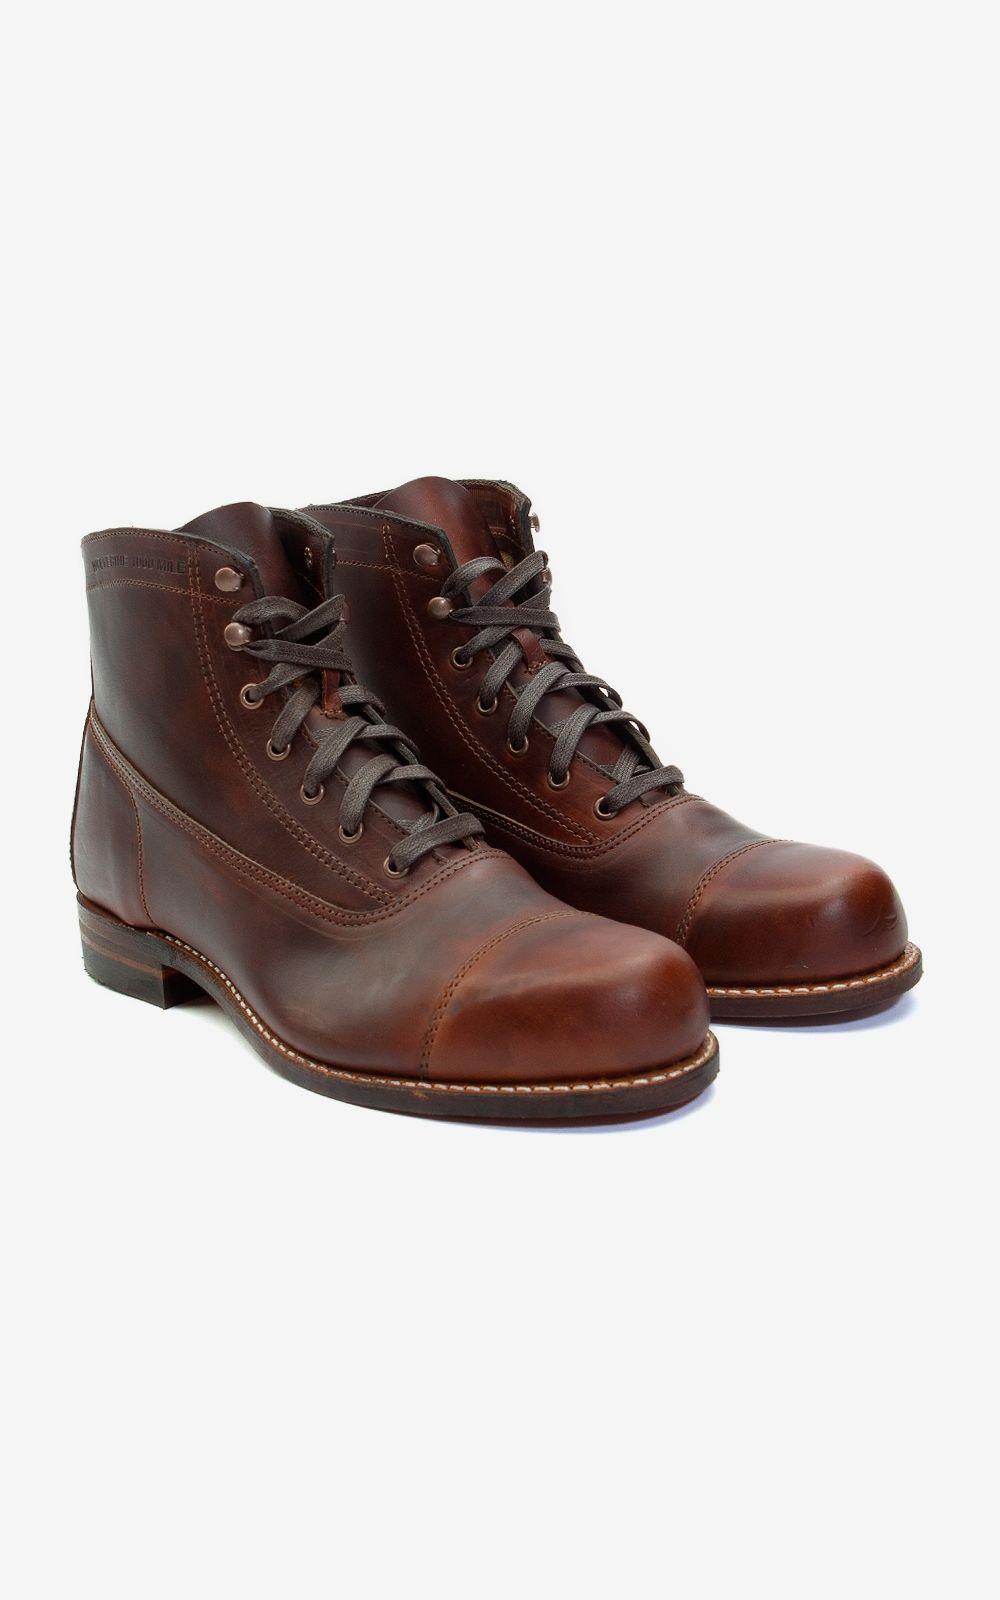 5a475af305e Wolverine, 1000, Mile, Boot, USA, Leather, Heritage, Vintage | The ...